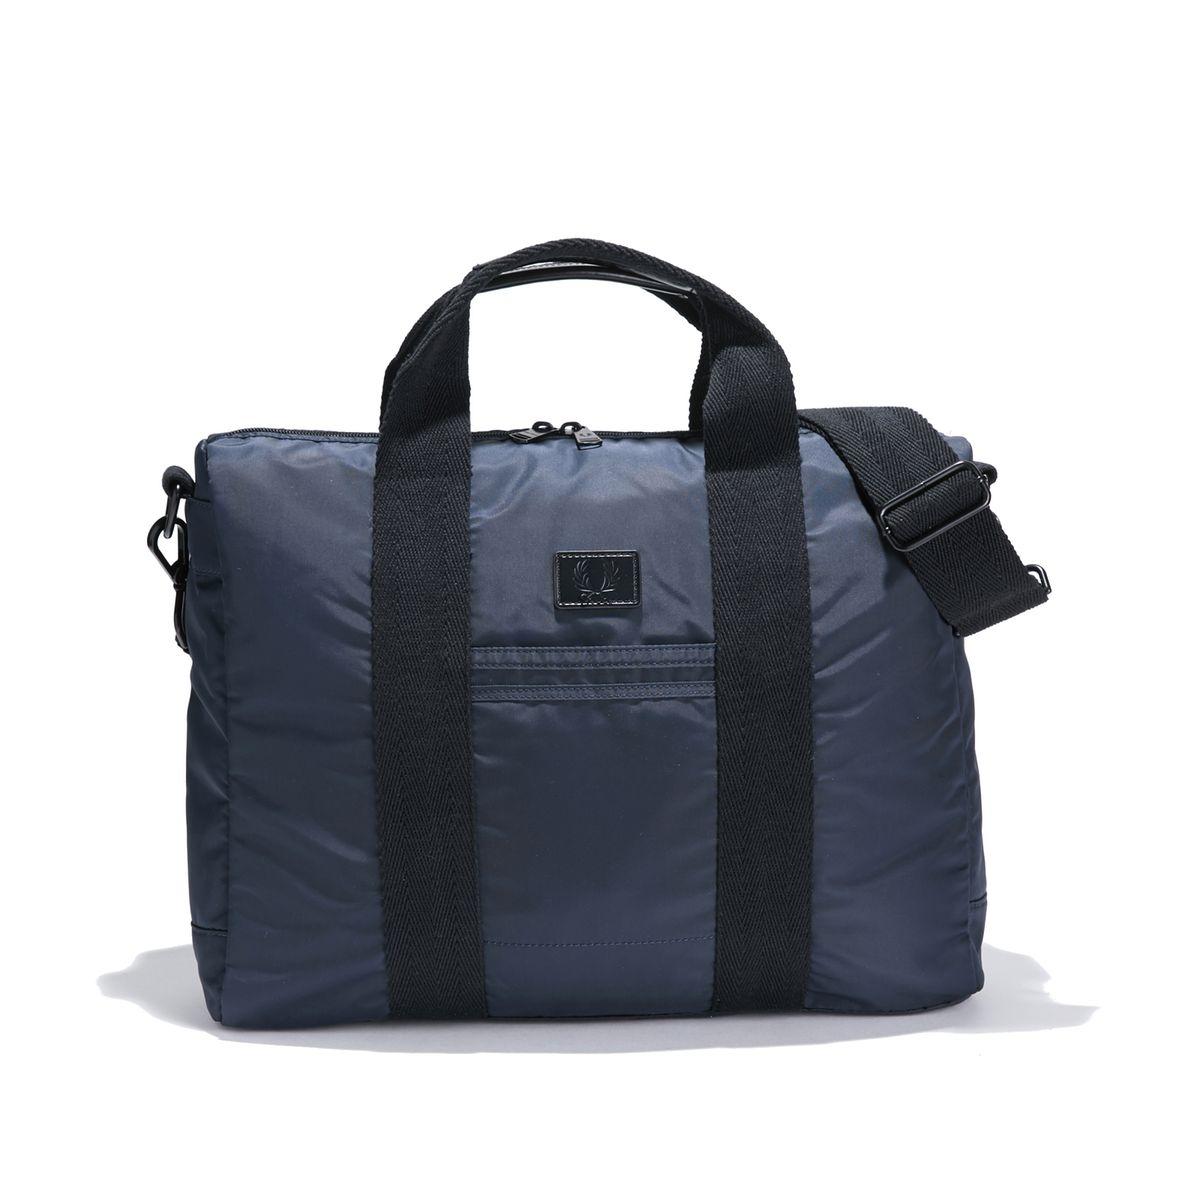 Sac porté épaule Sports Nylon Work Bag